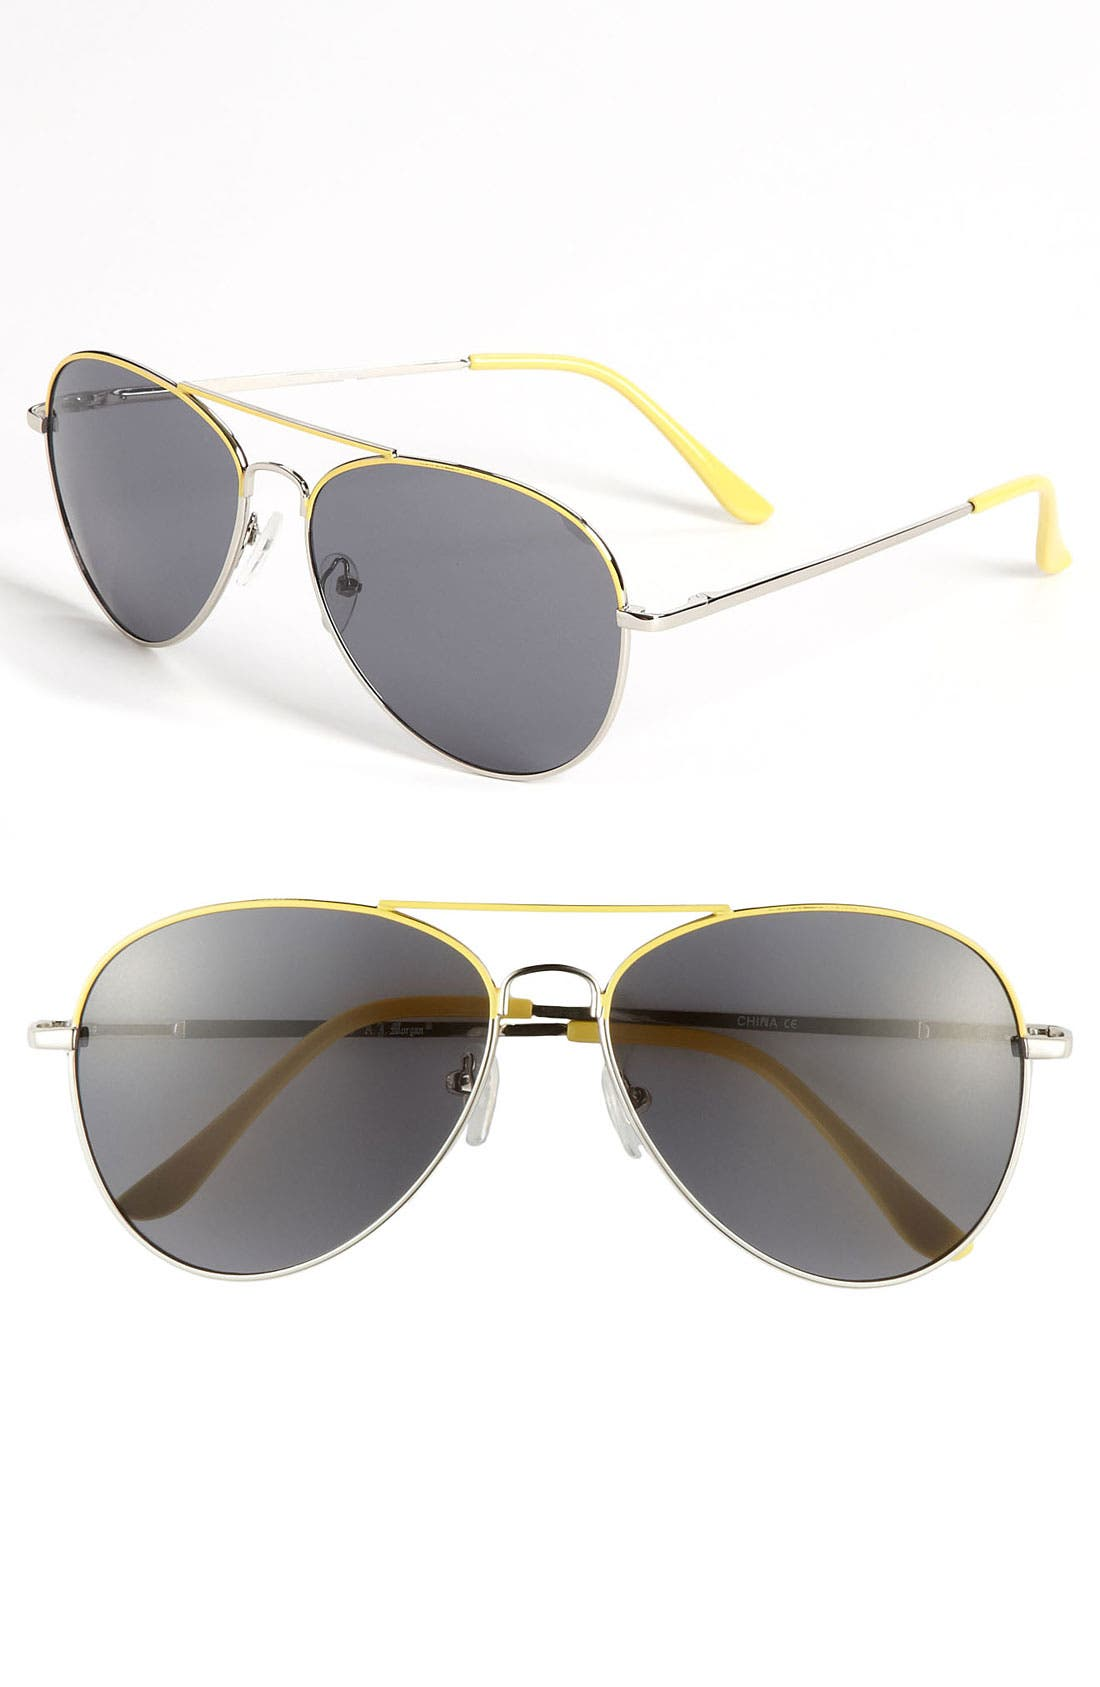 Main Image - A.J. Morgan 'Front Row' 60mm Sunglasses